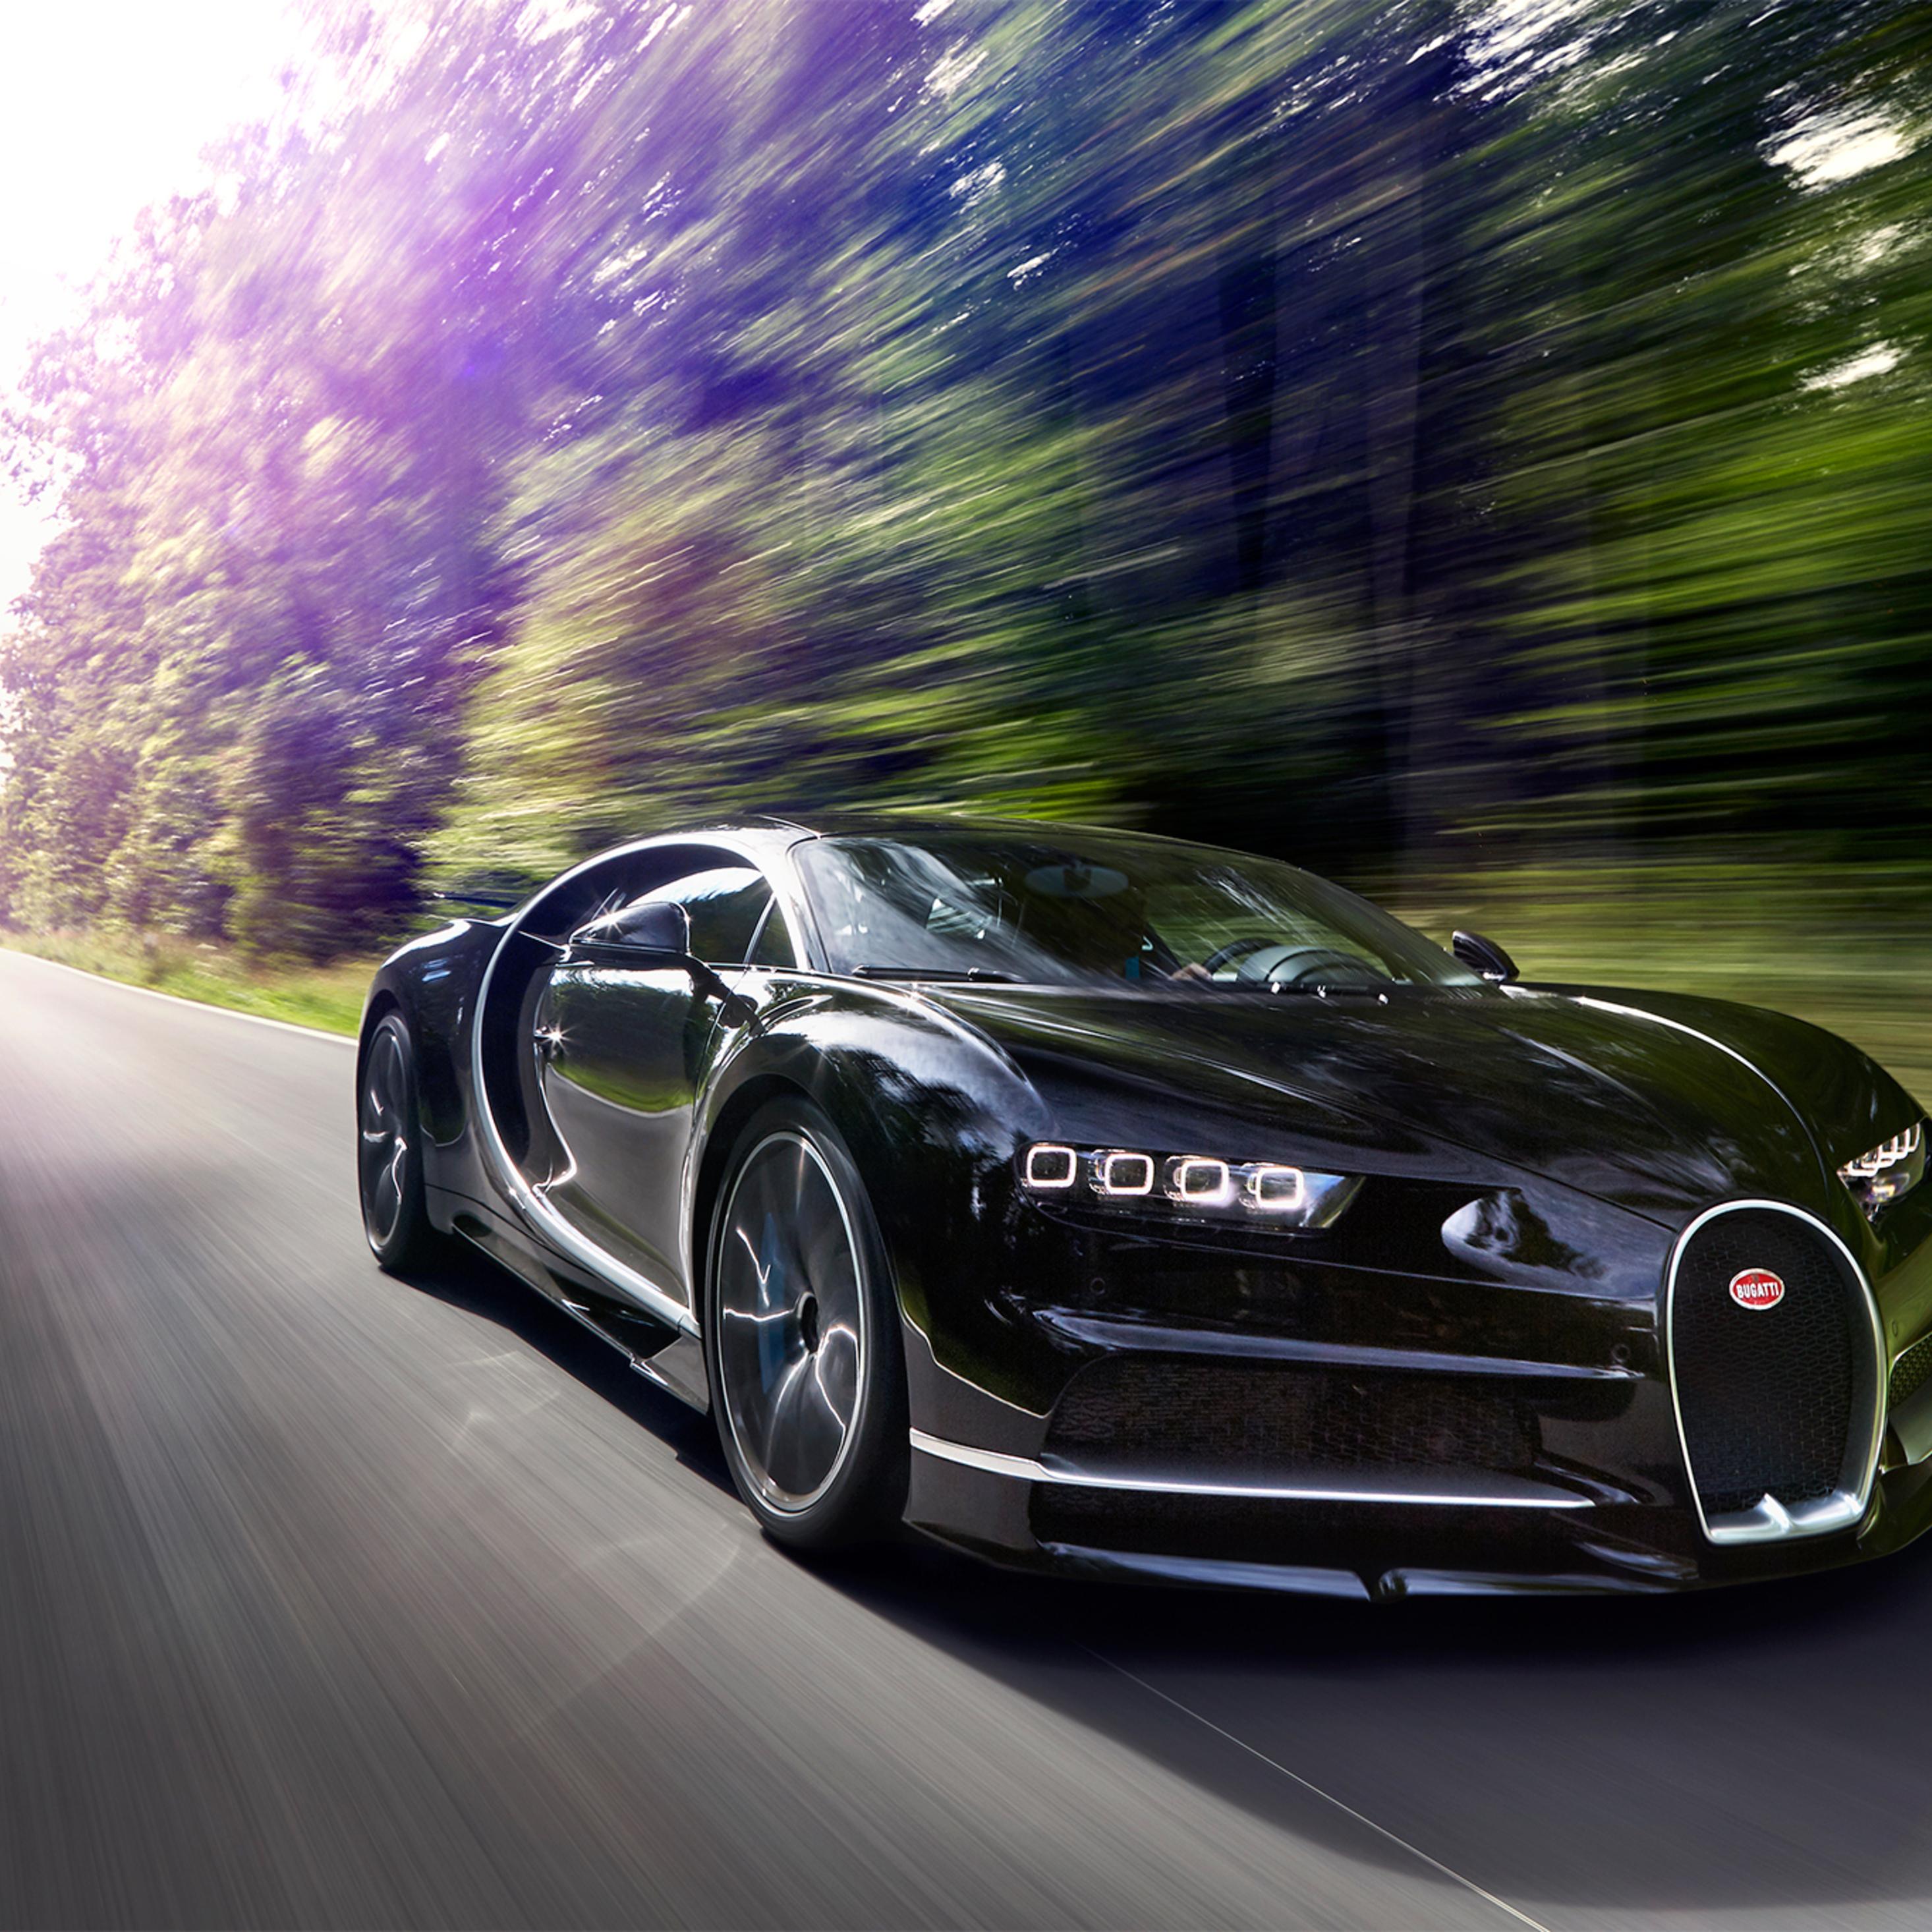 2932x2932 2017 Bugatti Chiron In Motion Ipad Pro Retina